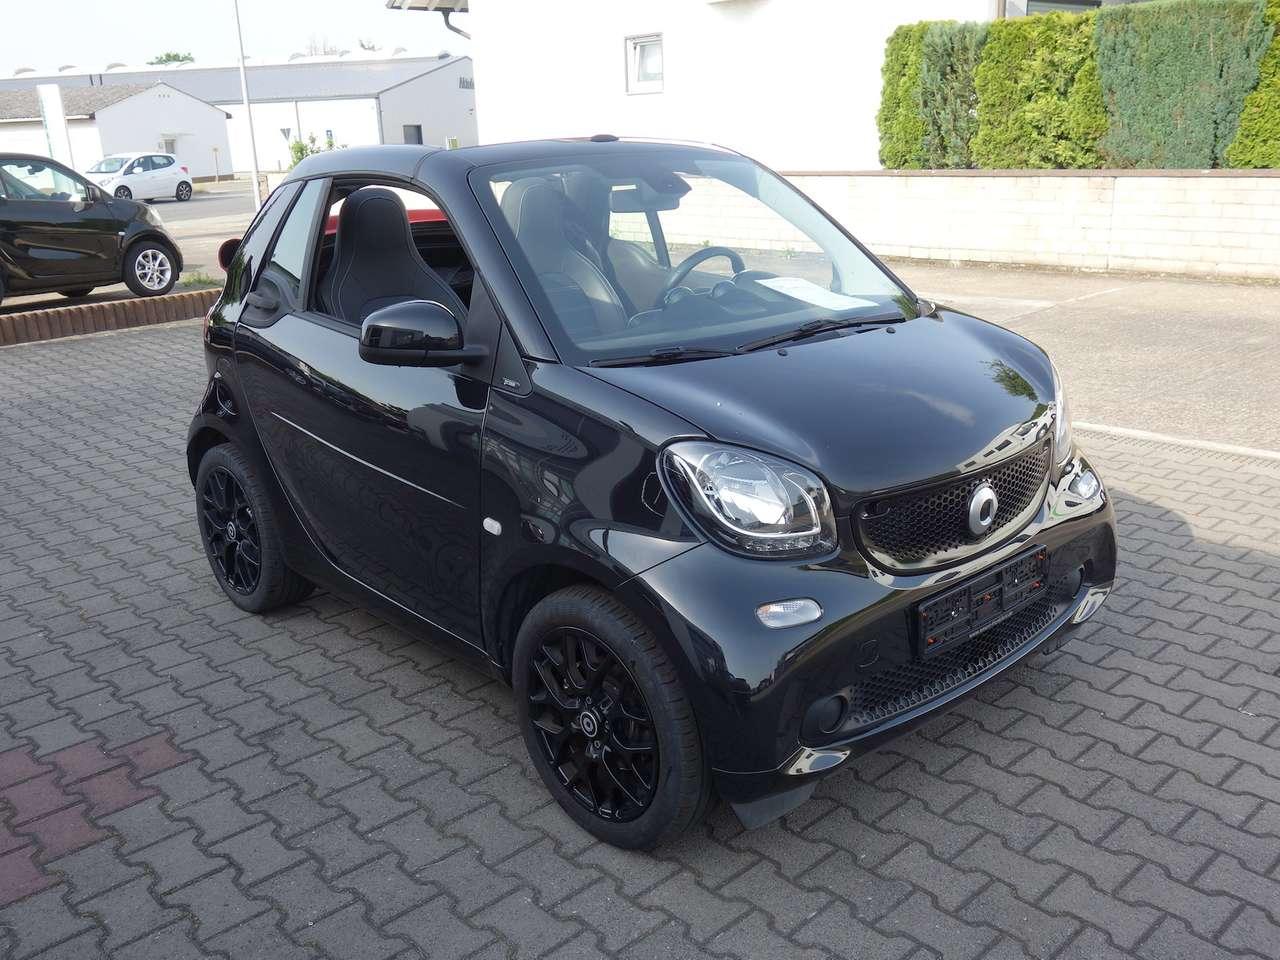 Autos nach Smart Fortwo fortwo cabrio 0.9 turbo